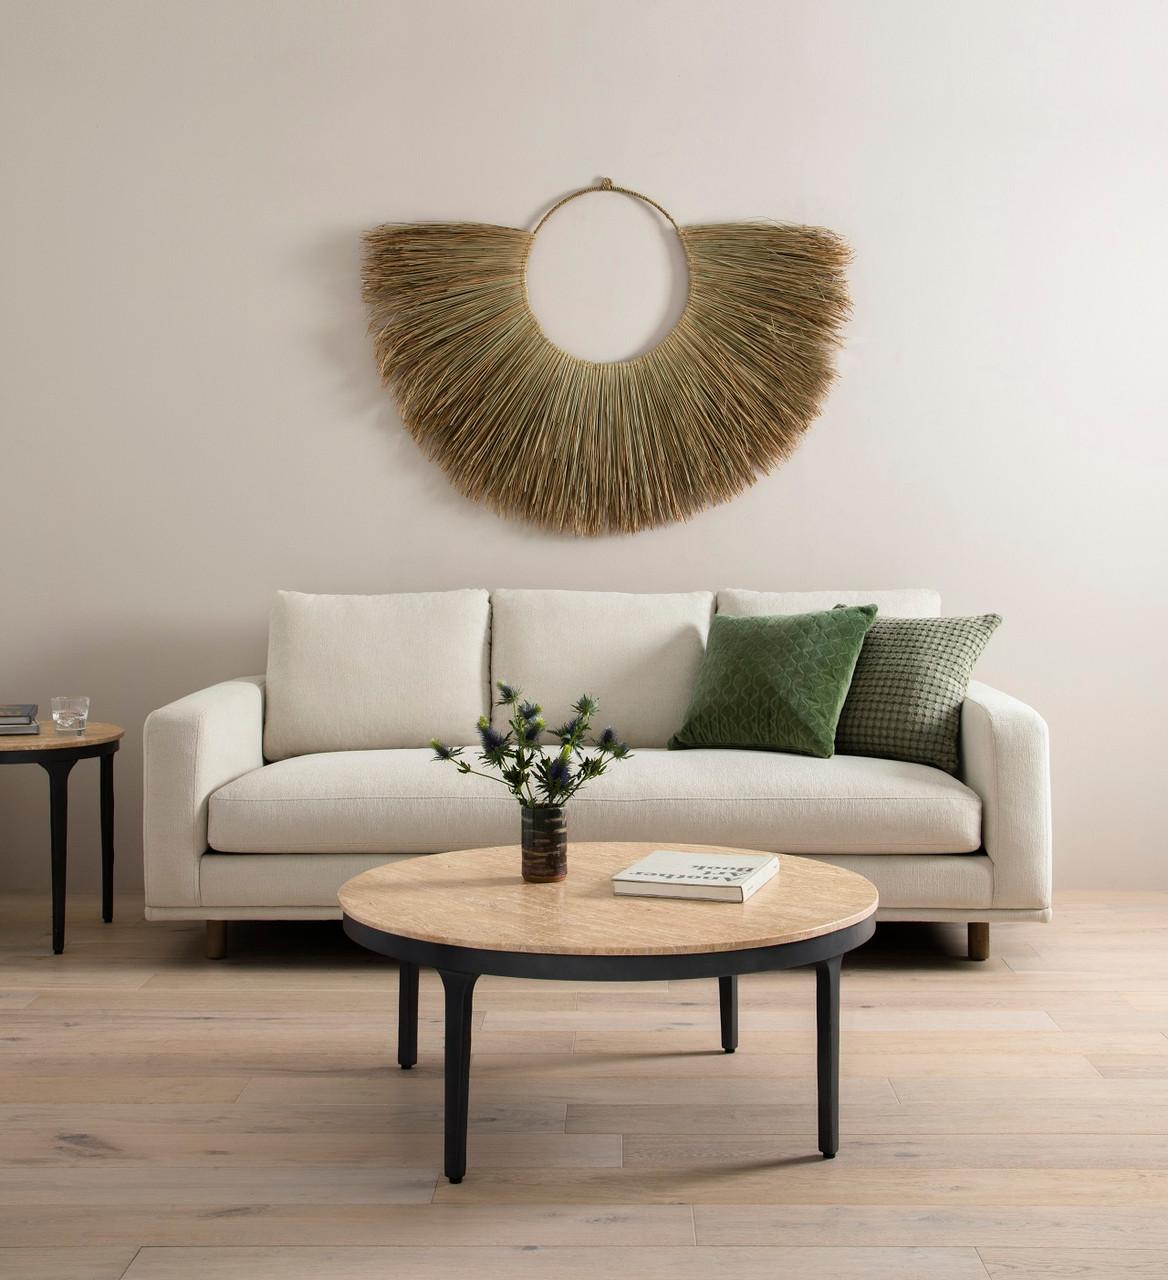 Palm Leaf Wall Hanging, Set of 3